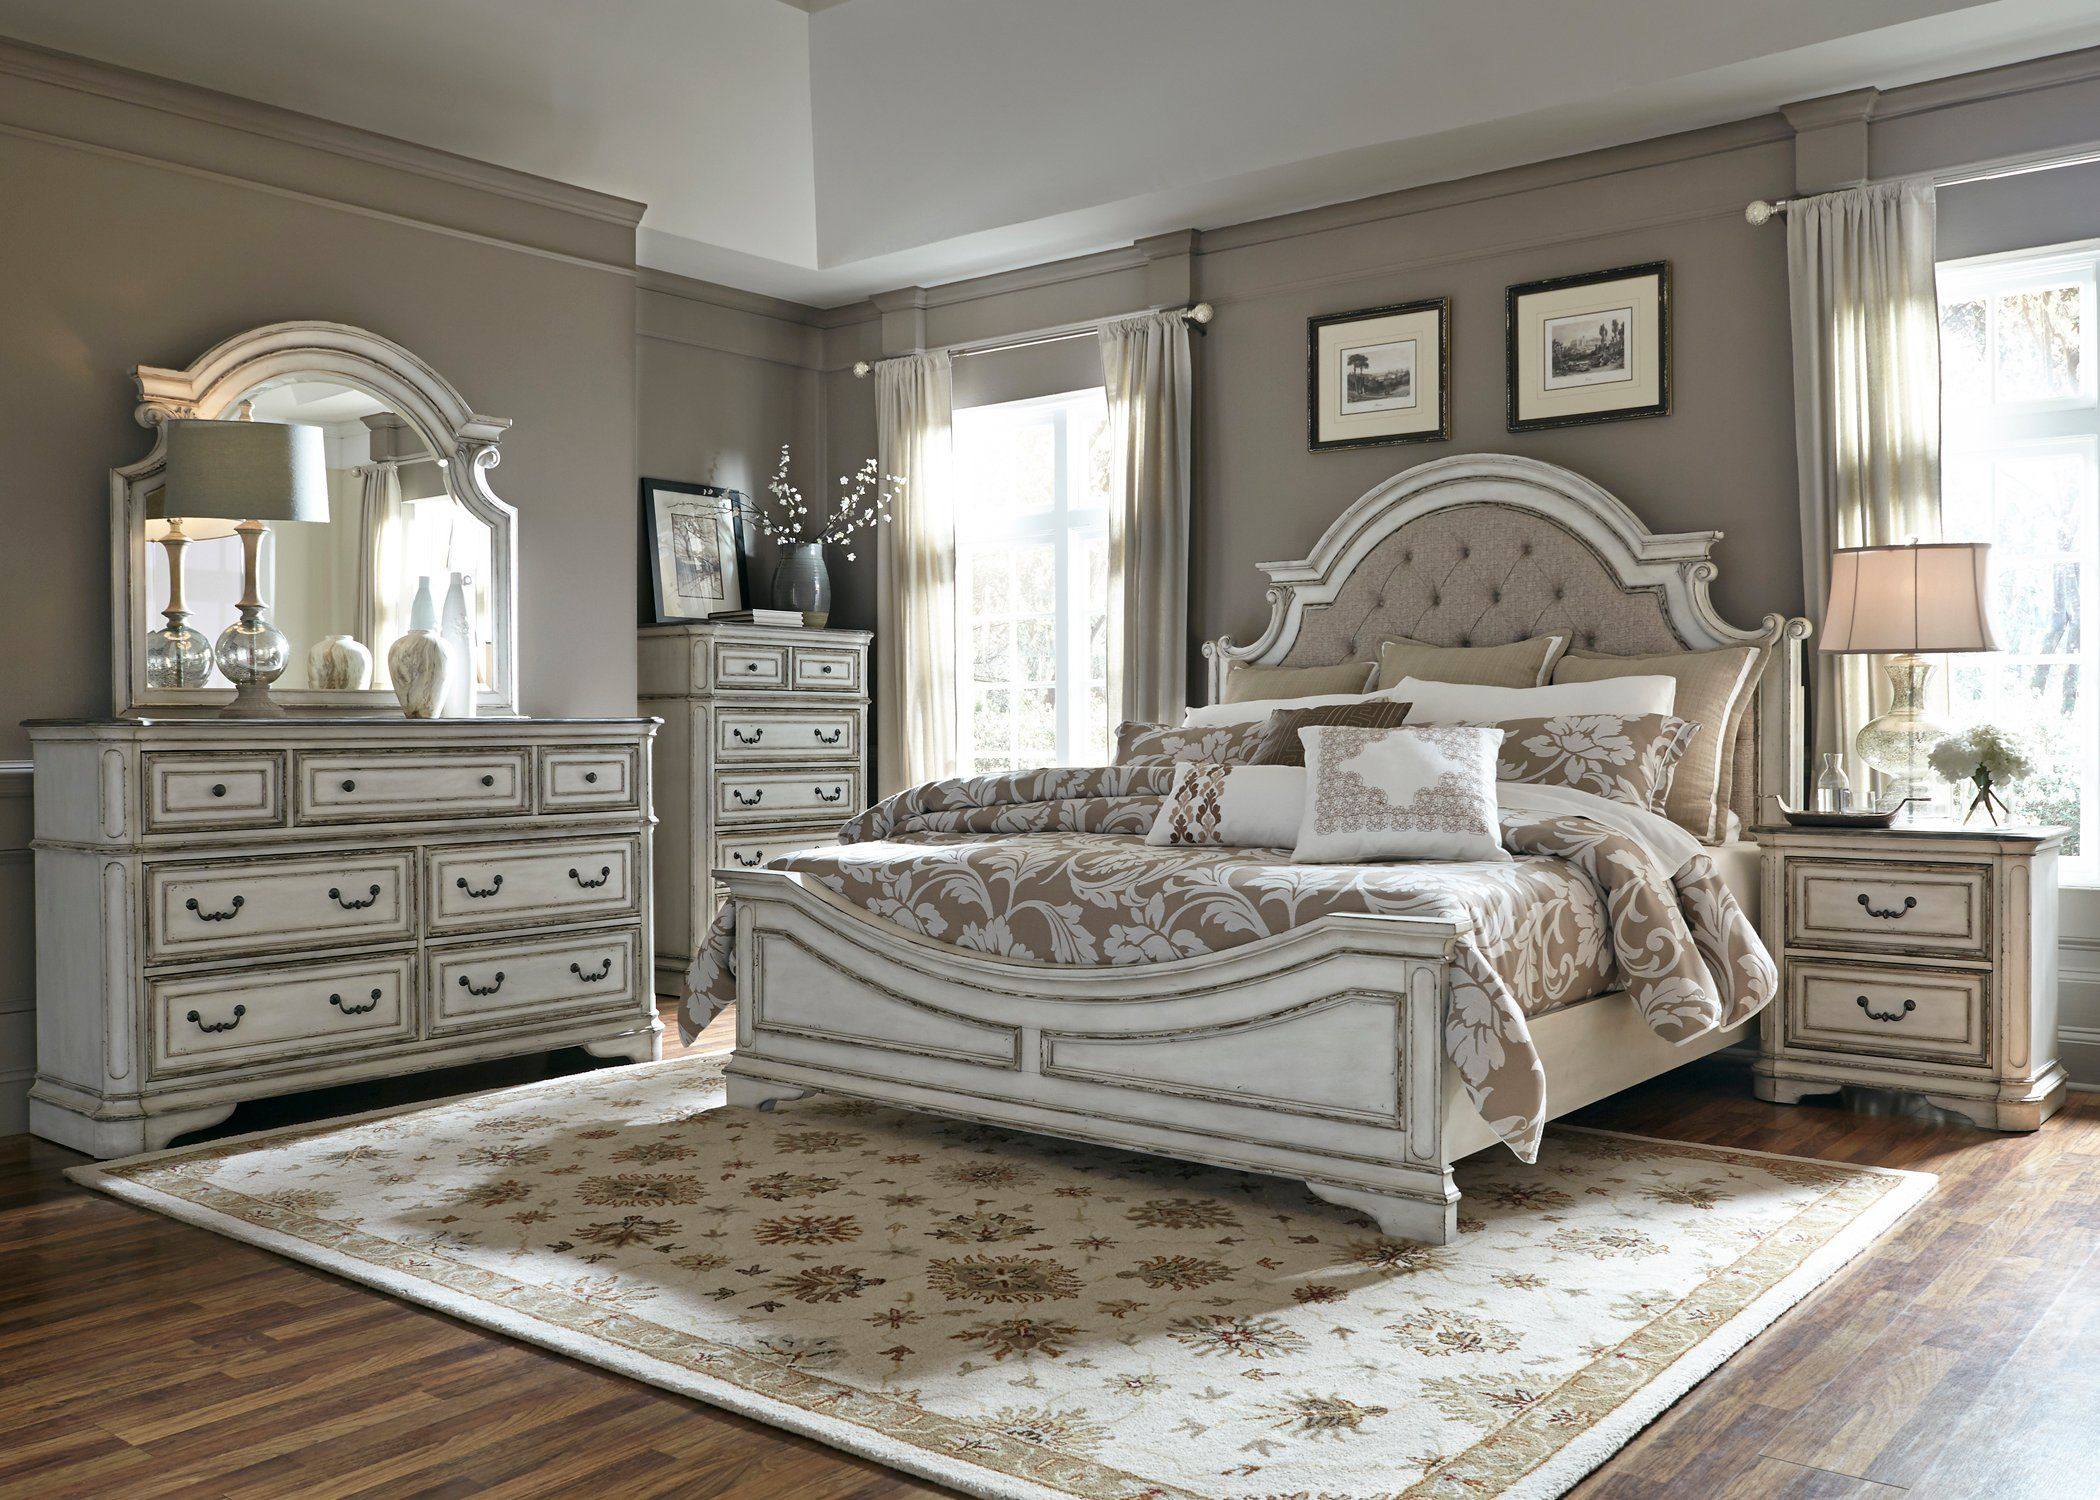 Best Antique White Traditional 4 Piece Queen Bedroom Set 640 x 480